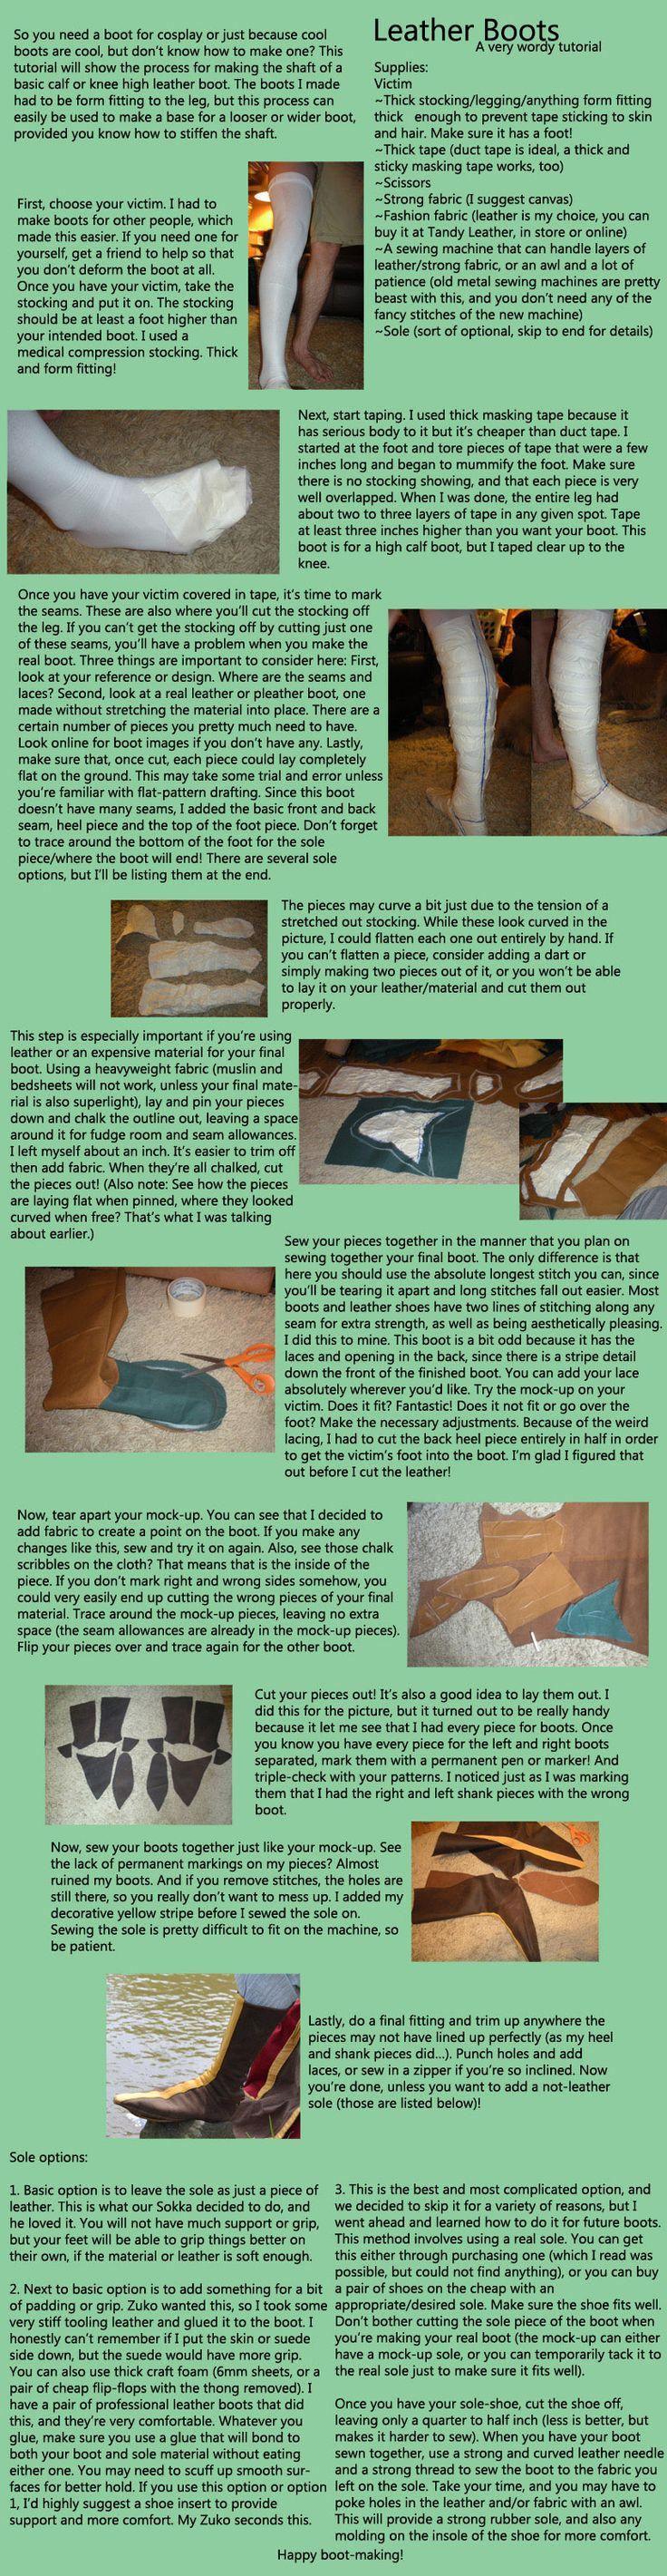 Leather Boot Tutorial by HarmonicCosplay.deviantart.com on @deviantART